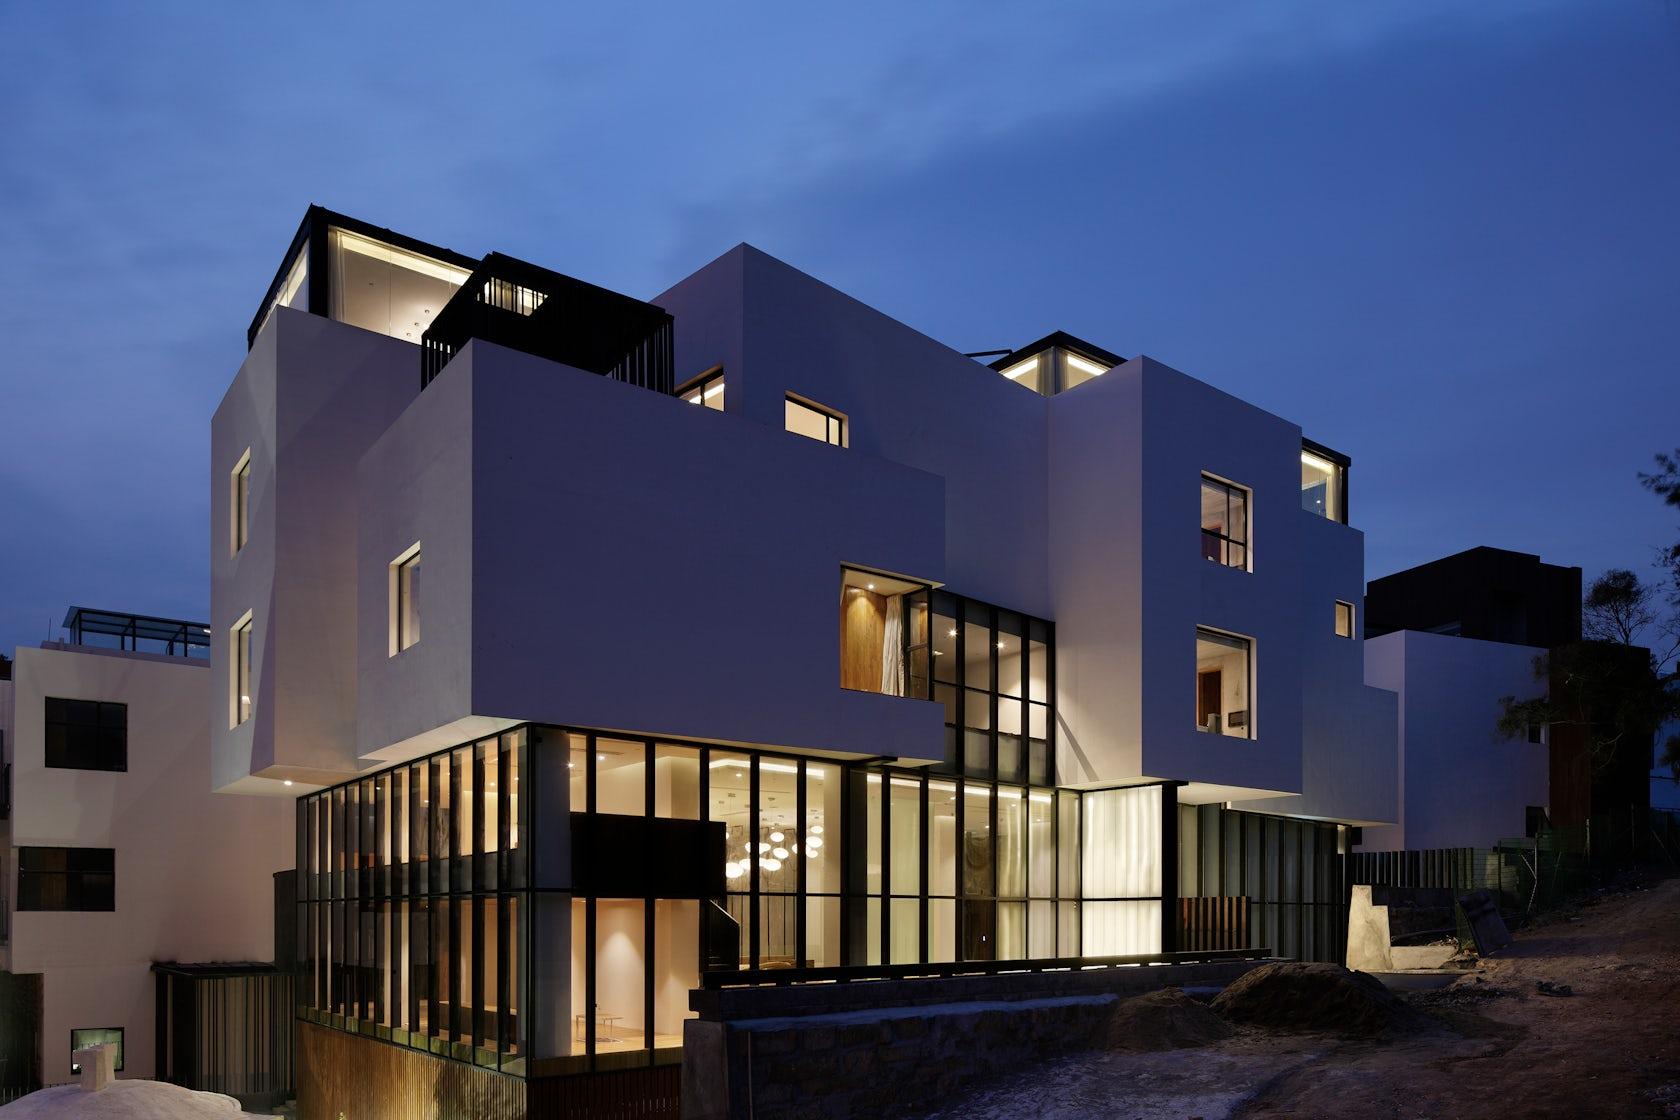 Hotel wind architizer for Architecture japonaise